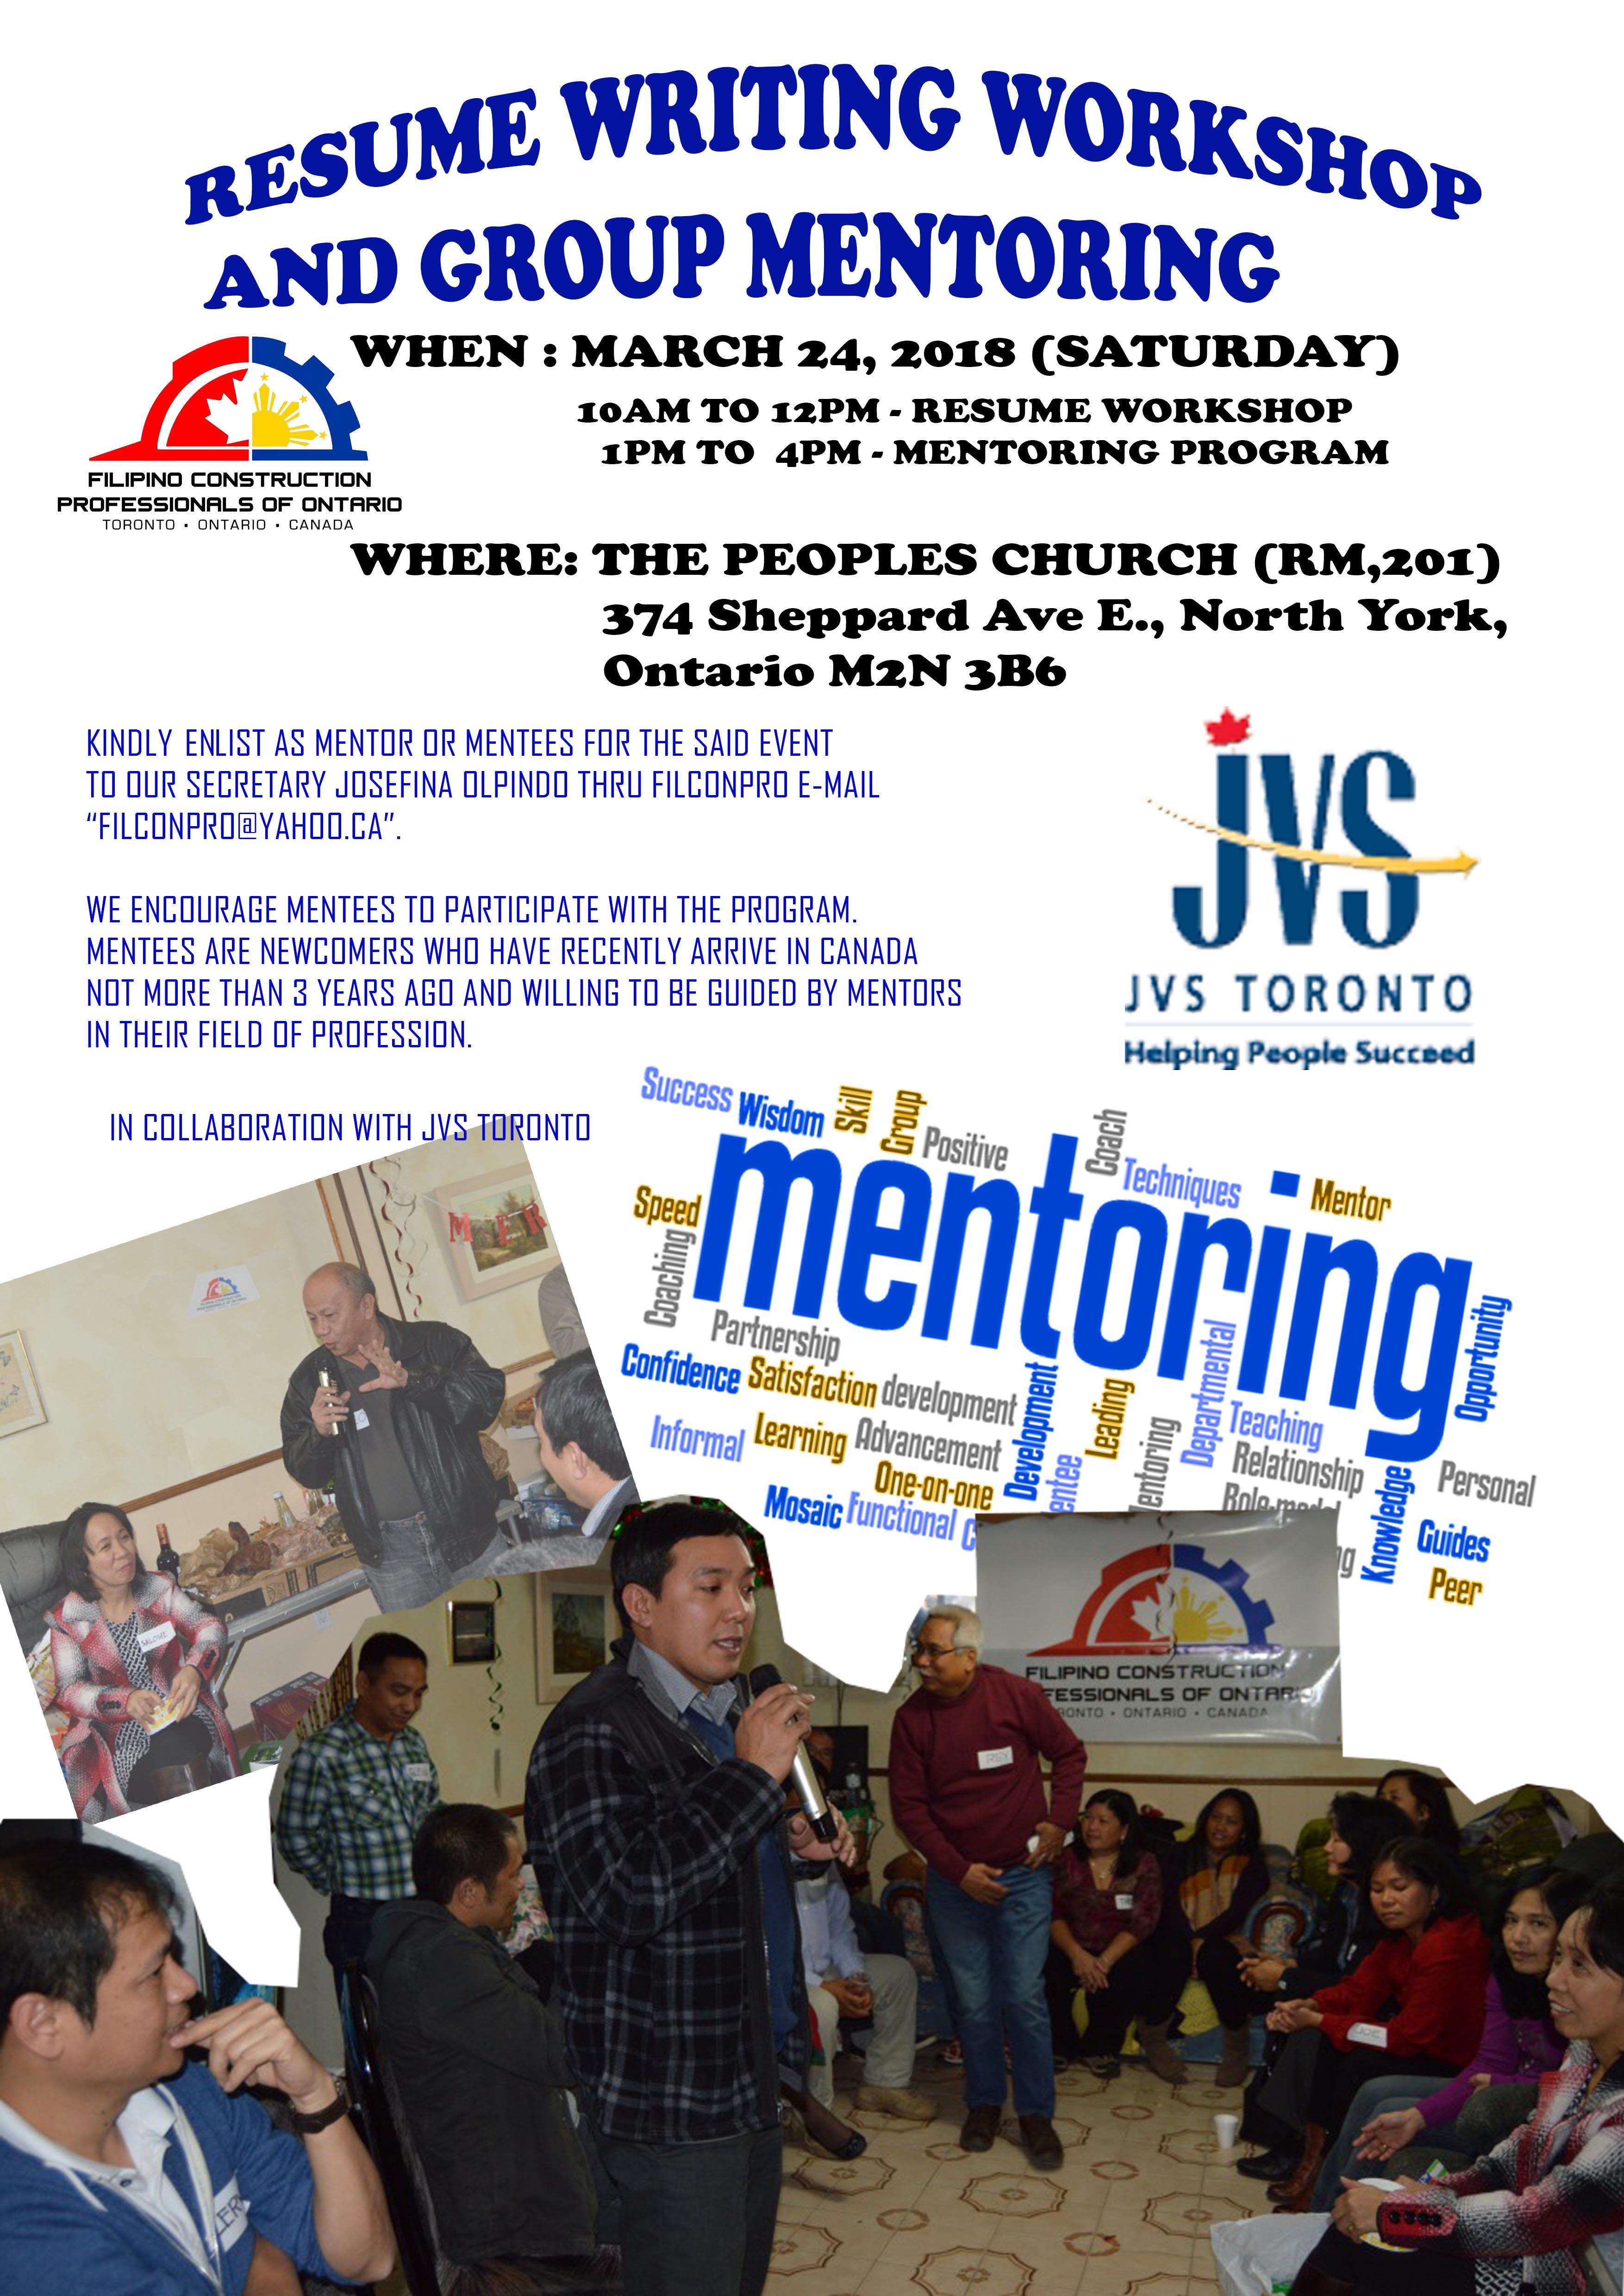 resume writing workshop and group mentoring program